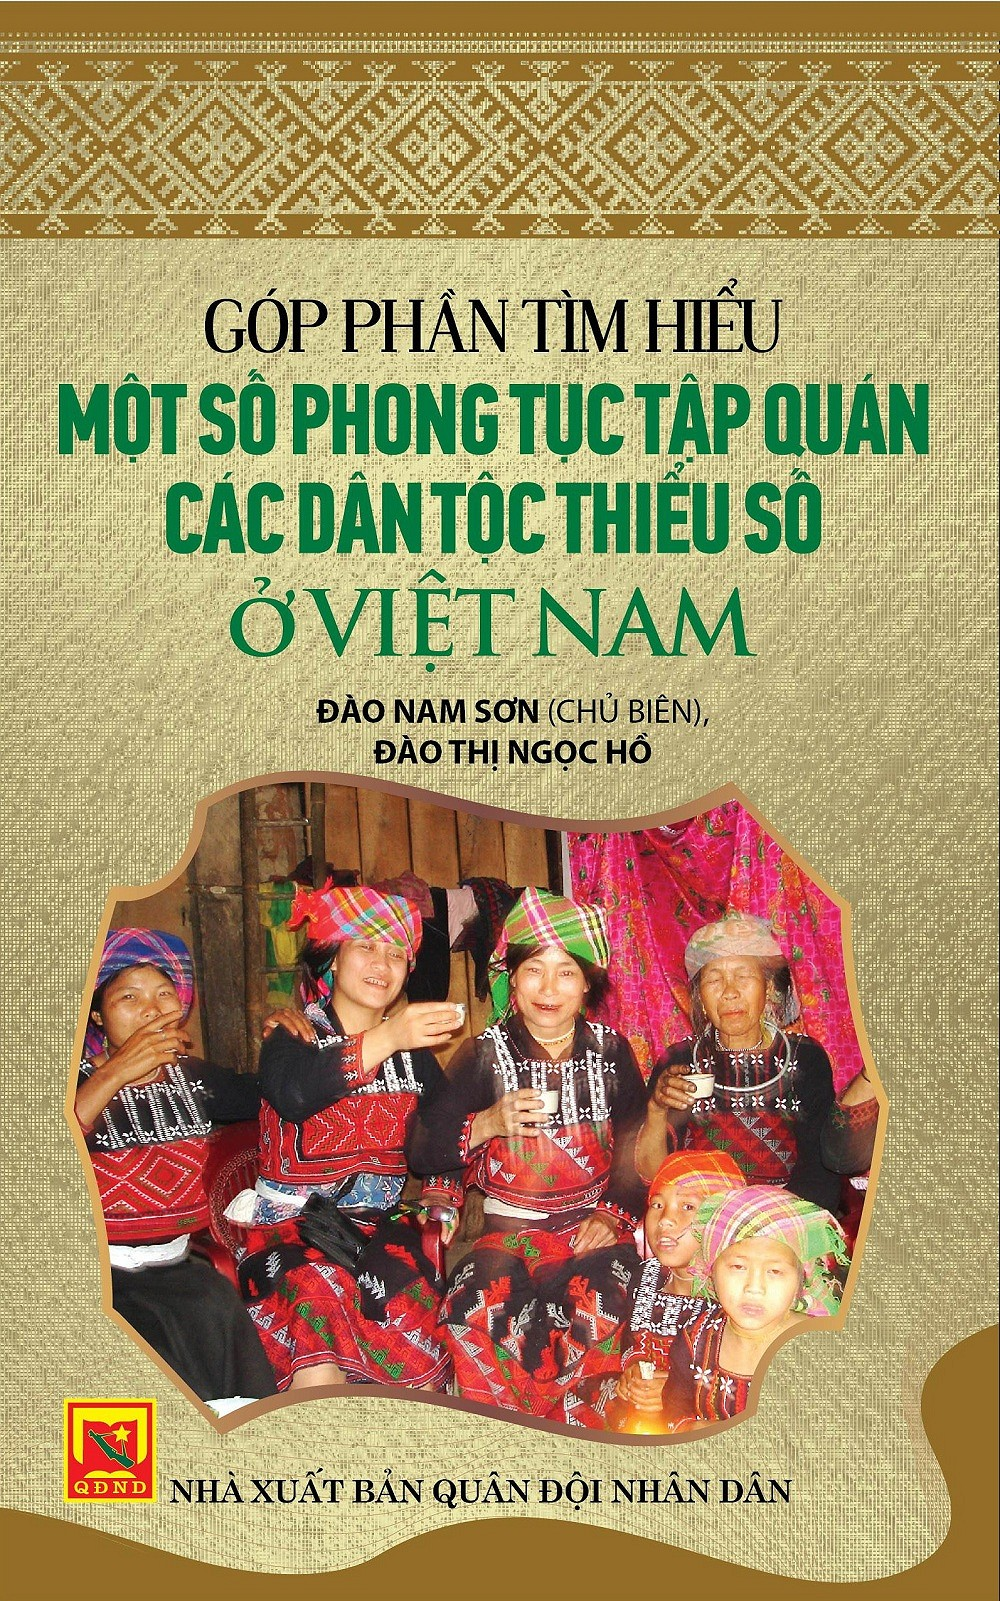 dao-nam-son-chu-bien-dao-thi-ngoc-ho.u547.d20161109.t141215.772367.jpg